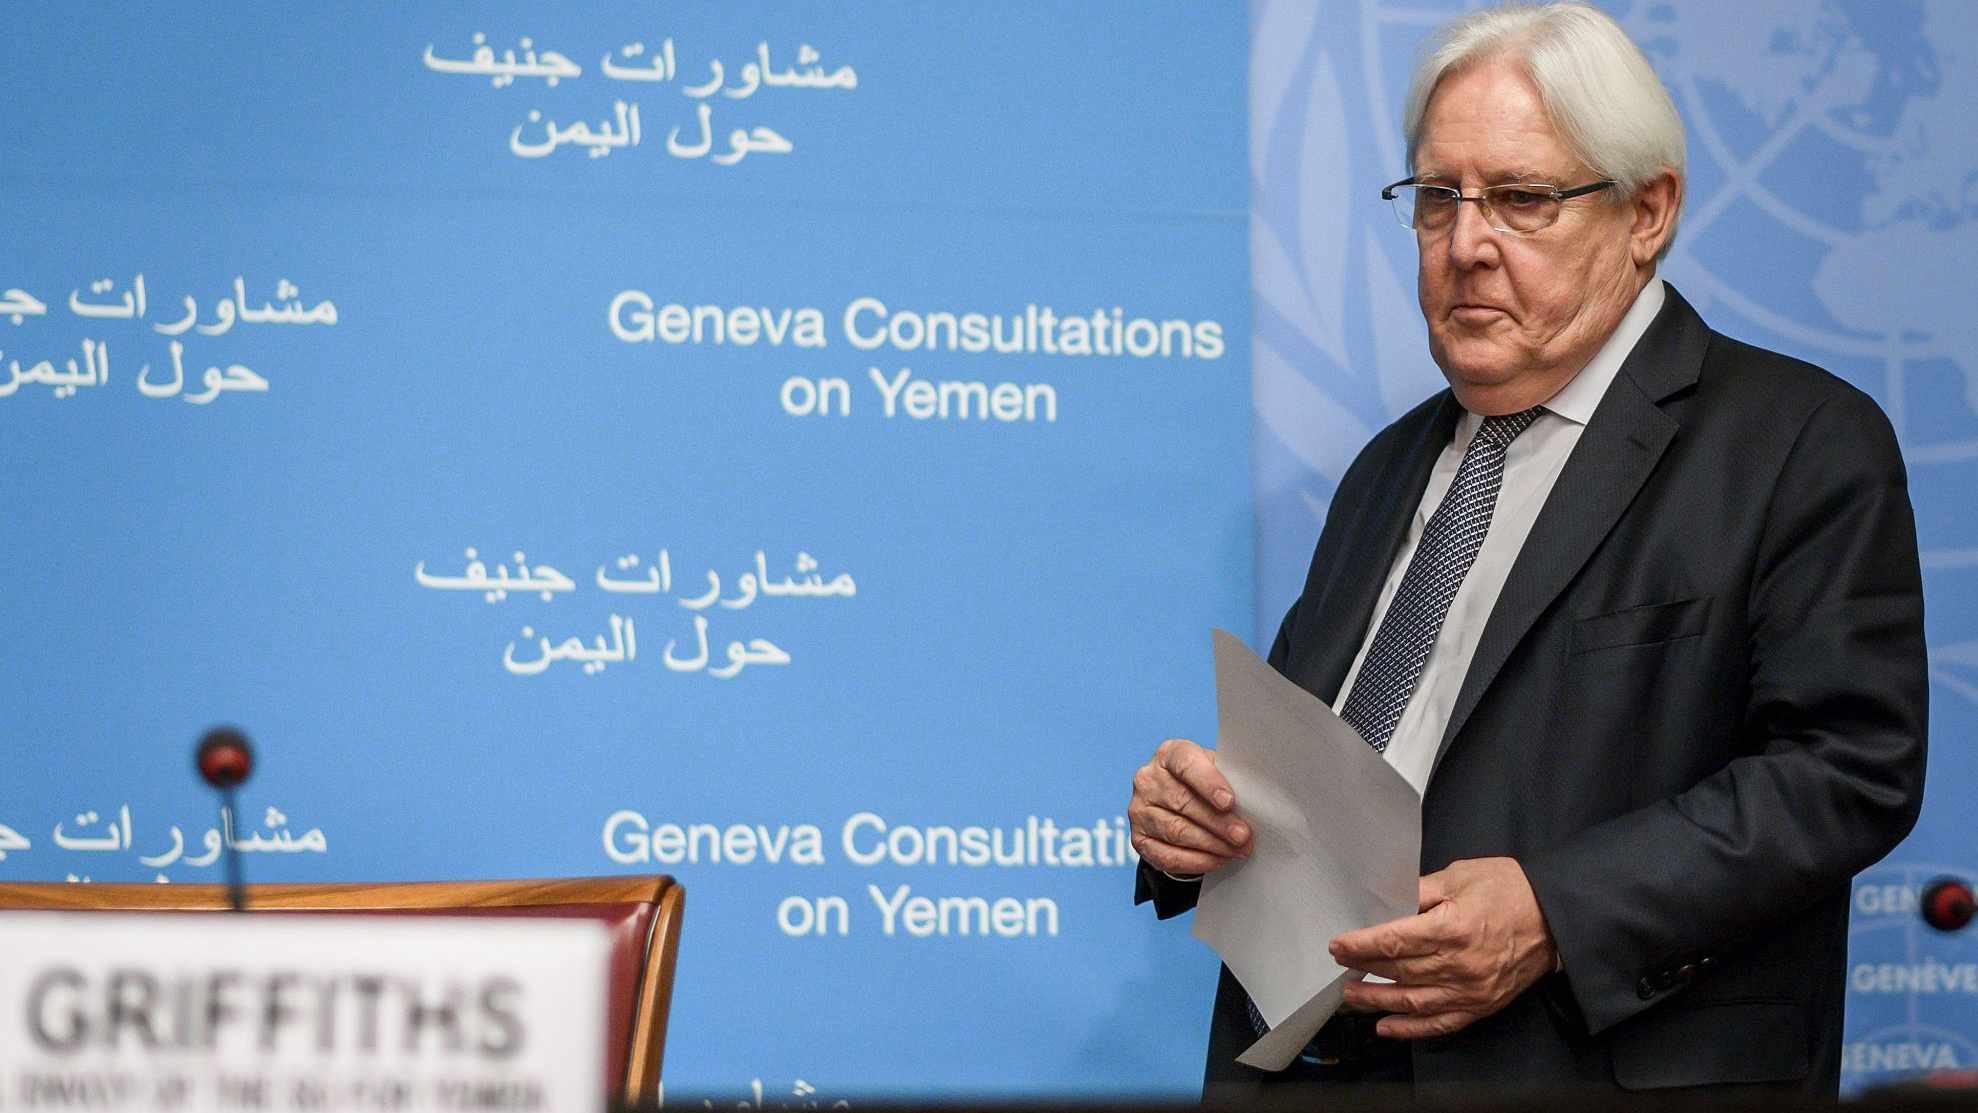 Yemen talks offer 'flickering signal of hope': UN envoy